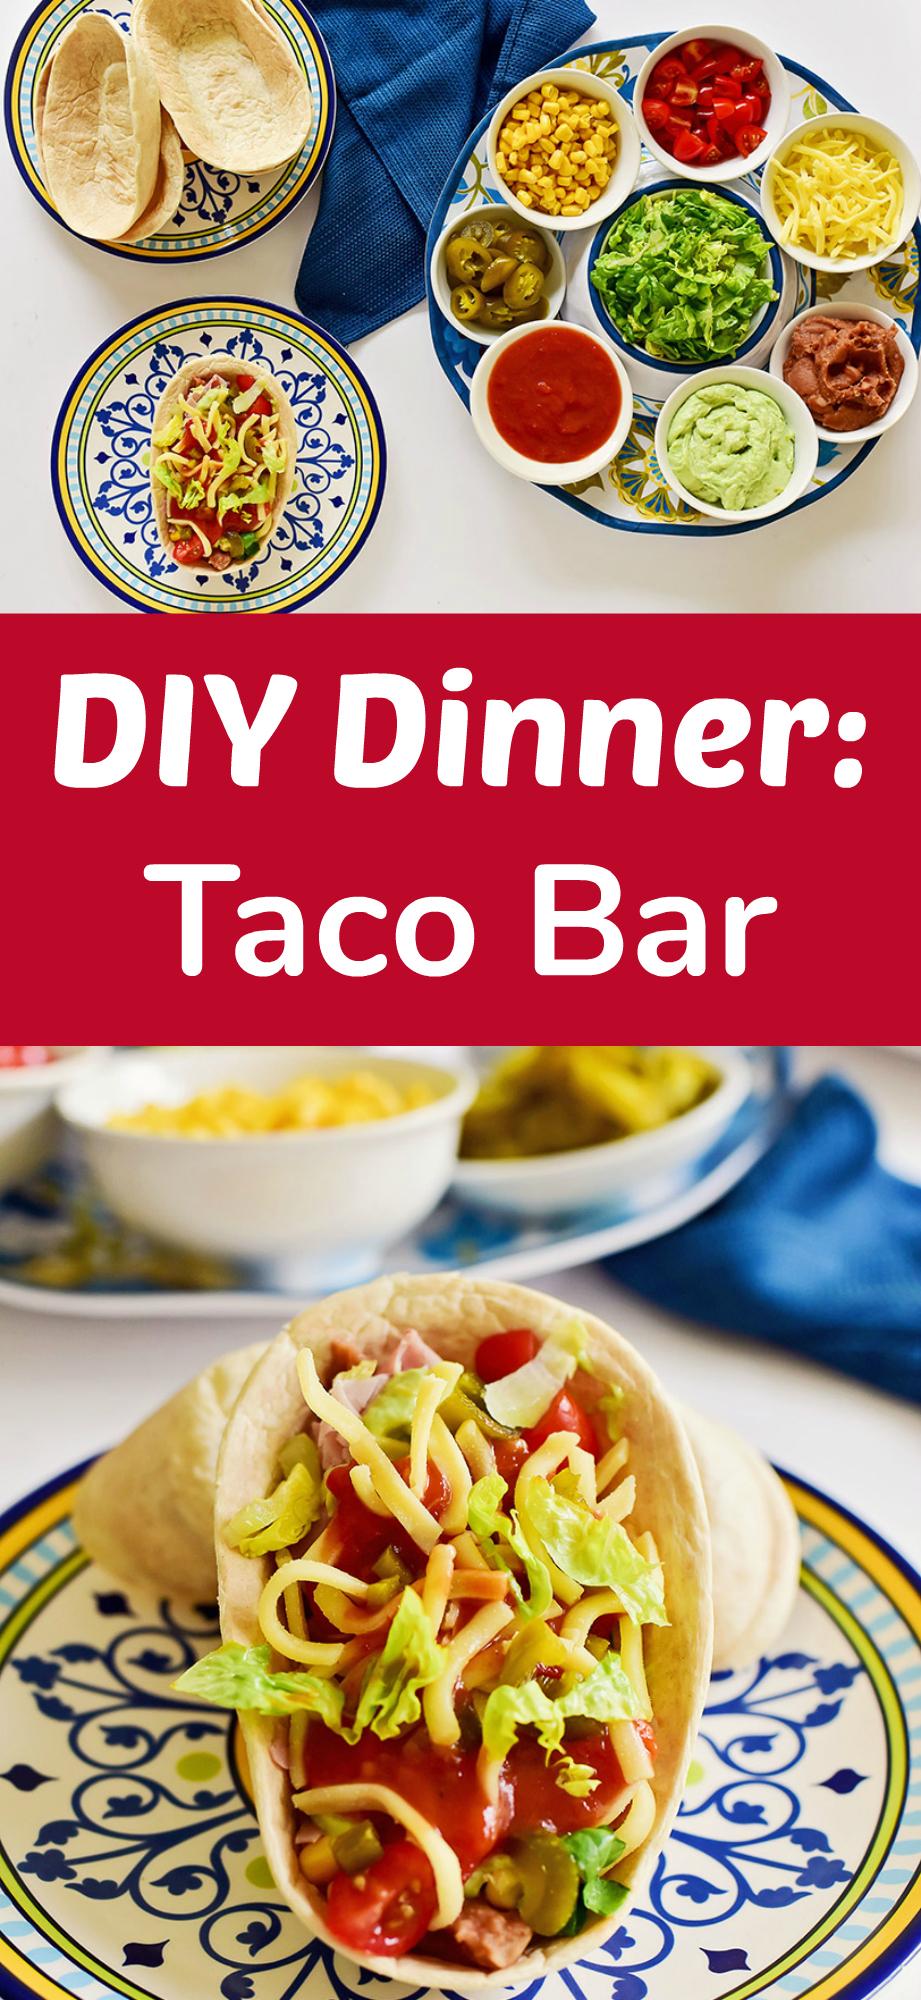 DIY Dinner Taco Bar